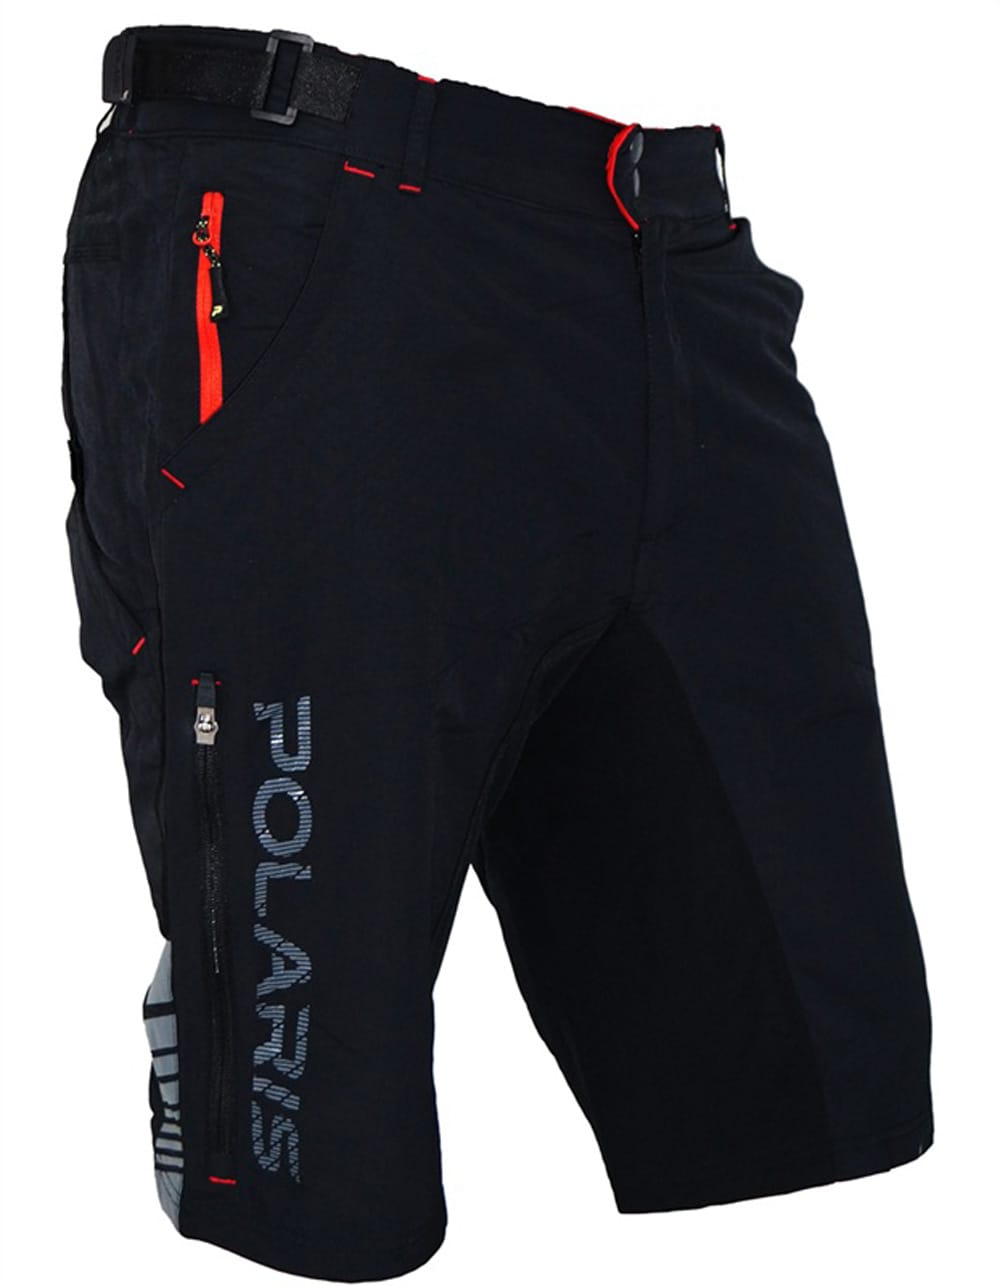 Polaris AM Descent Shorts